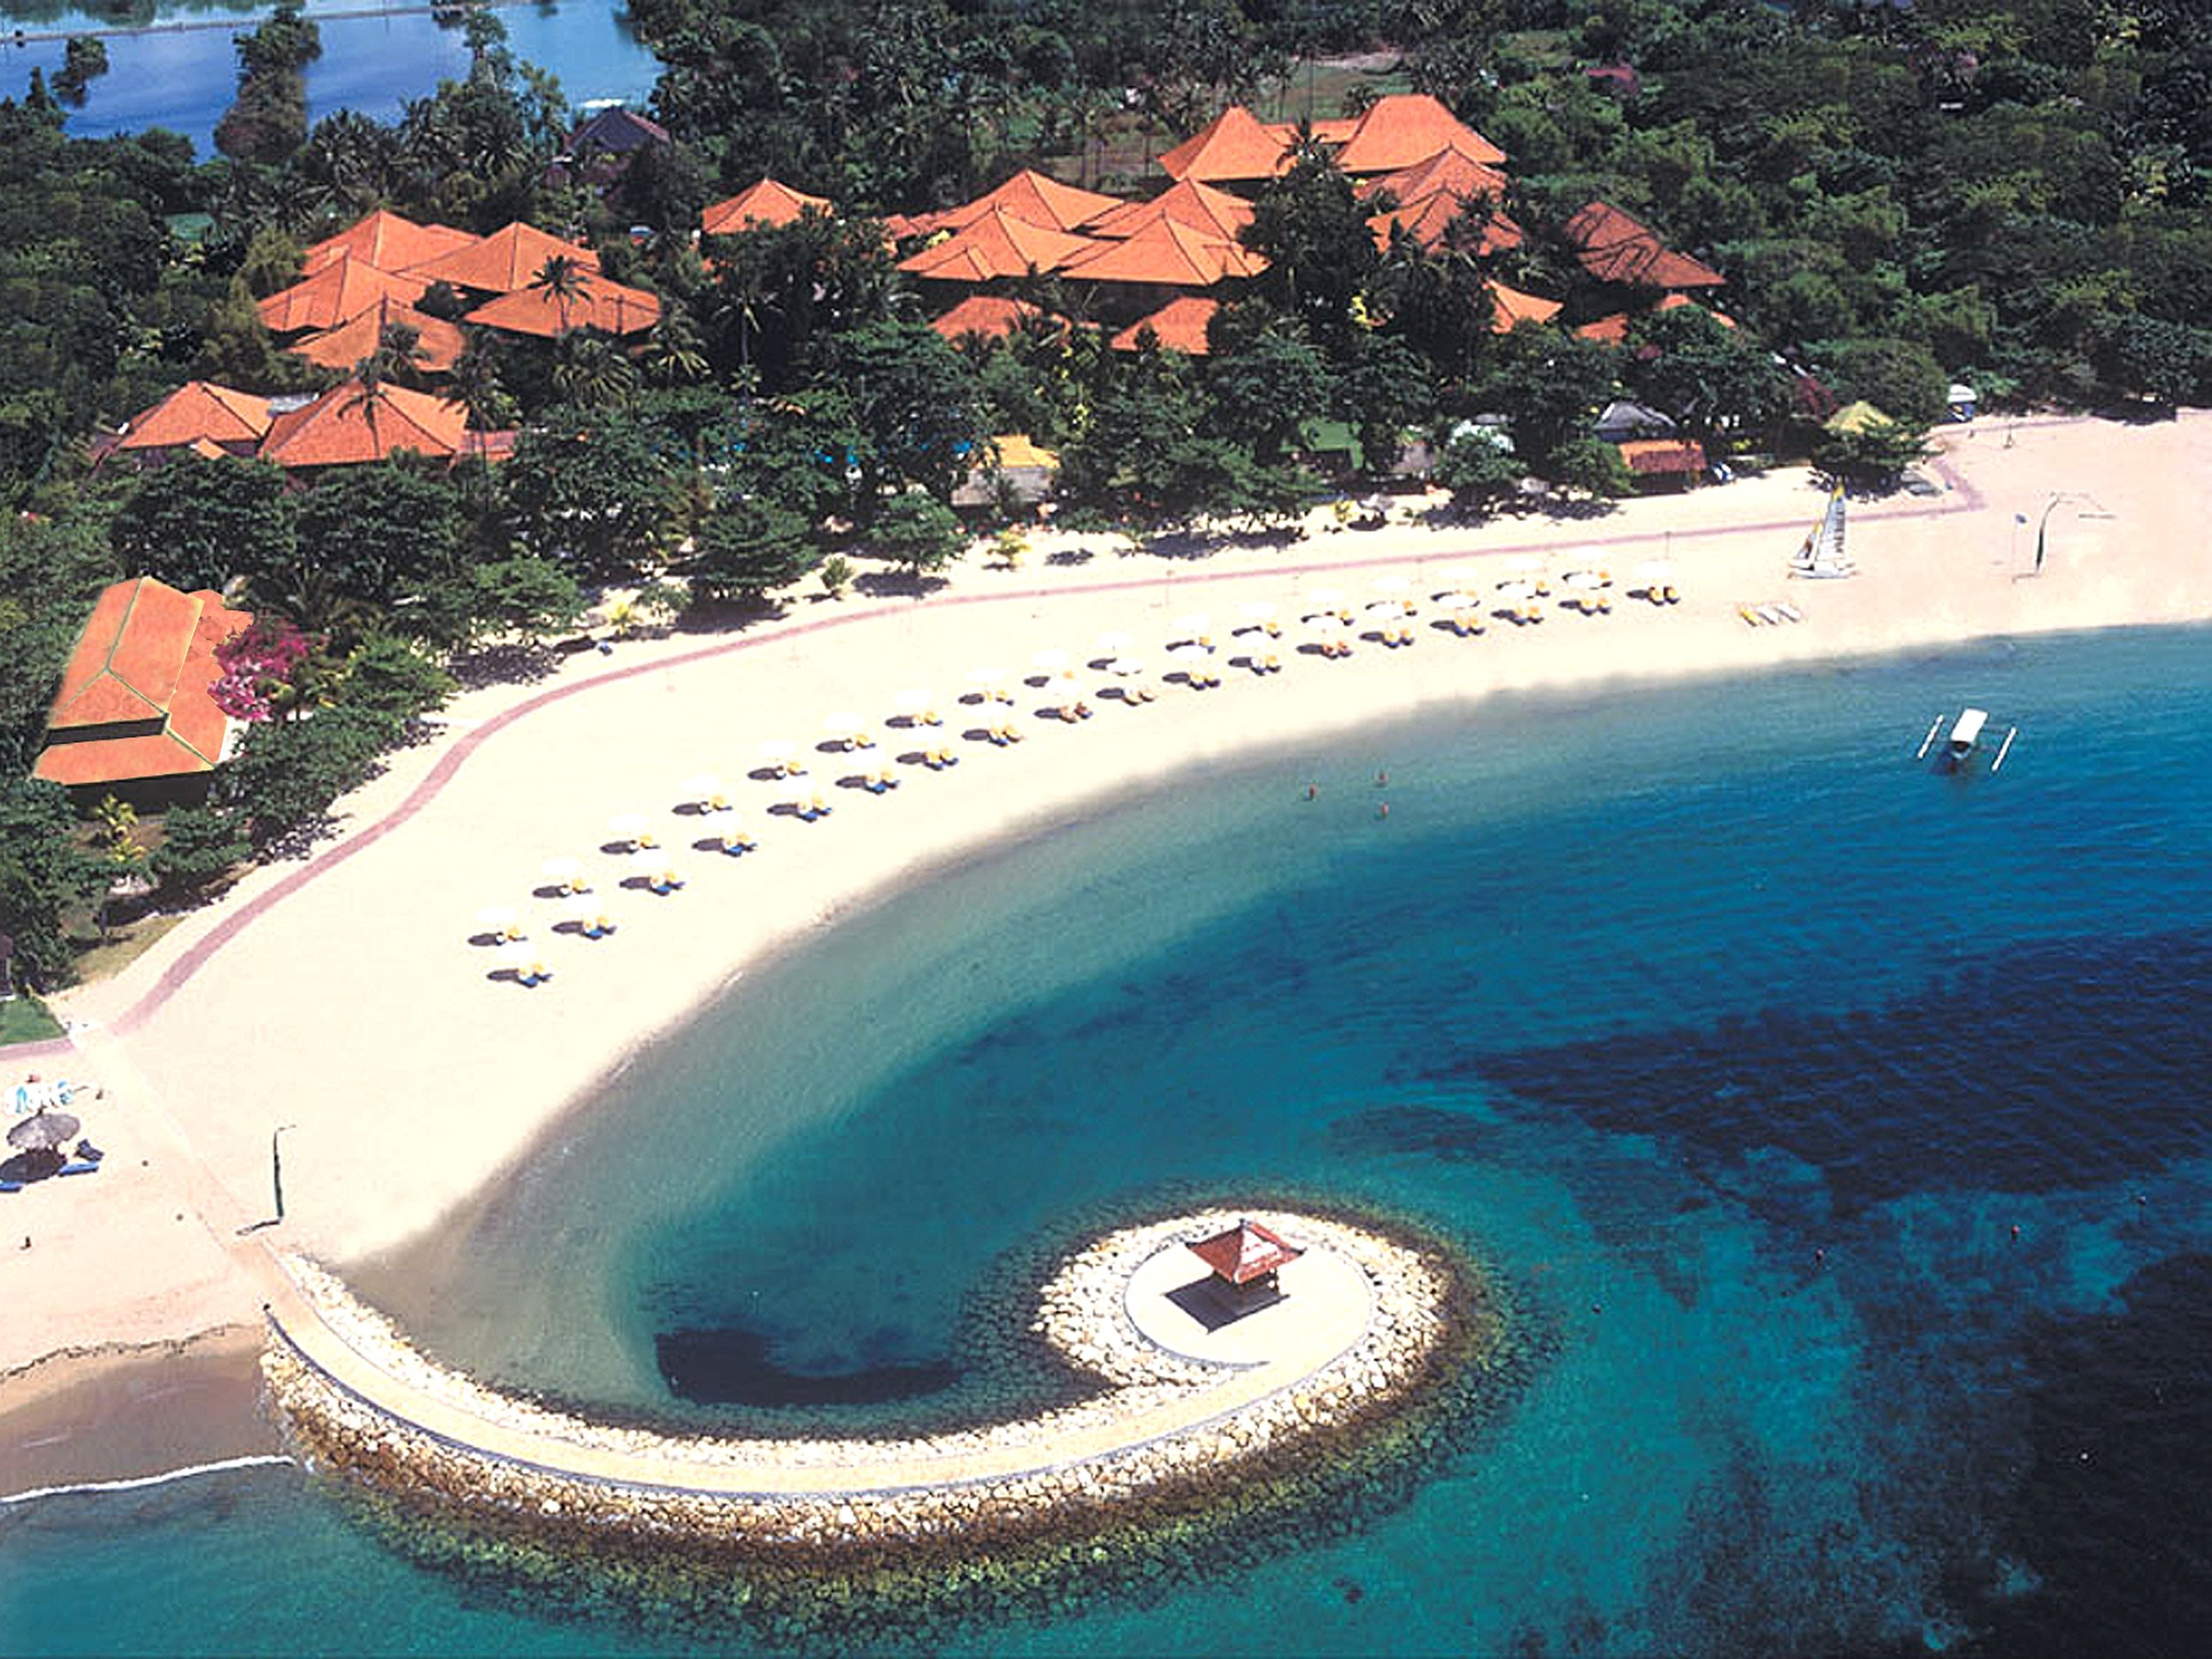 Bali tropic resort and spa   Tanjung Benoa    Images / fact sheet / Video